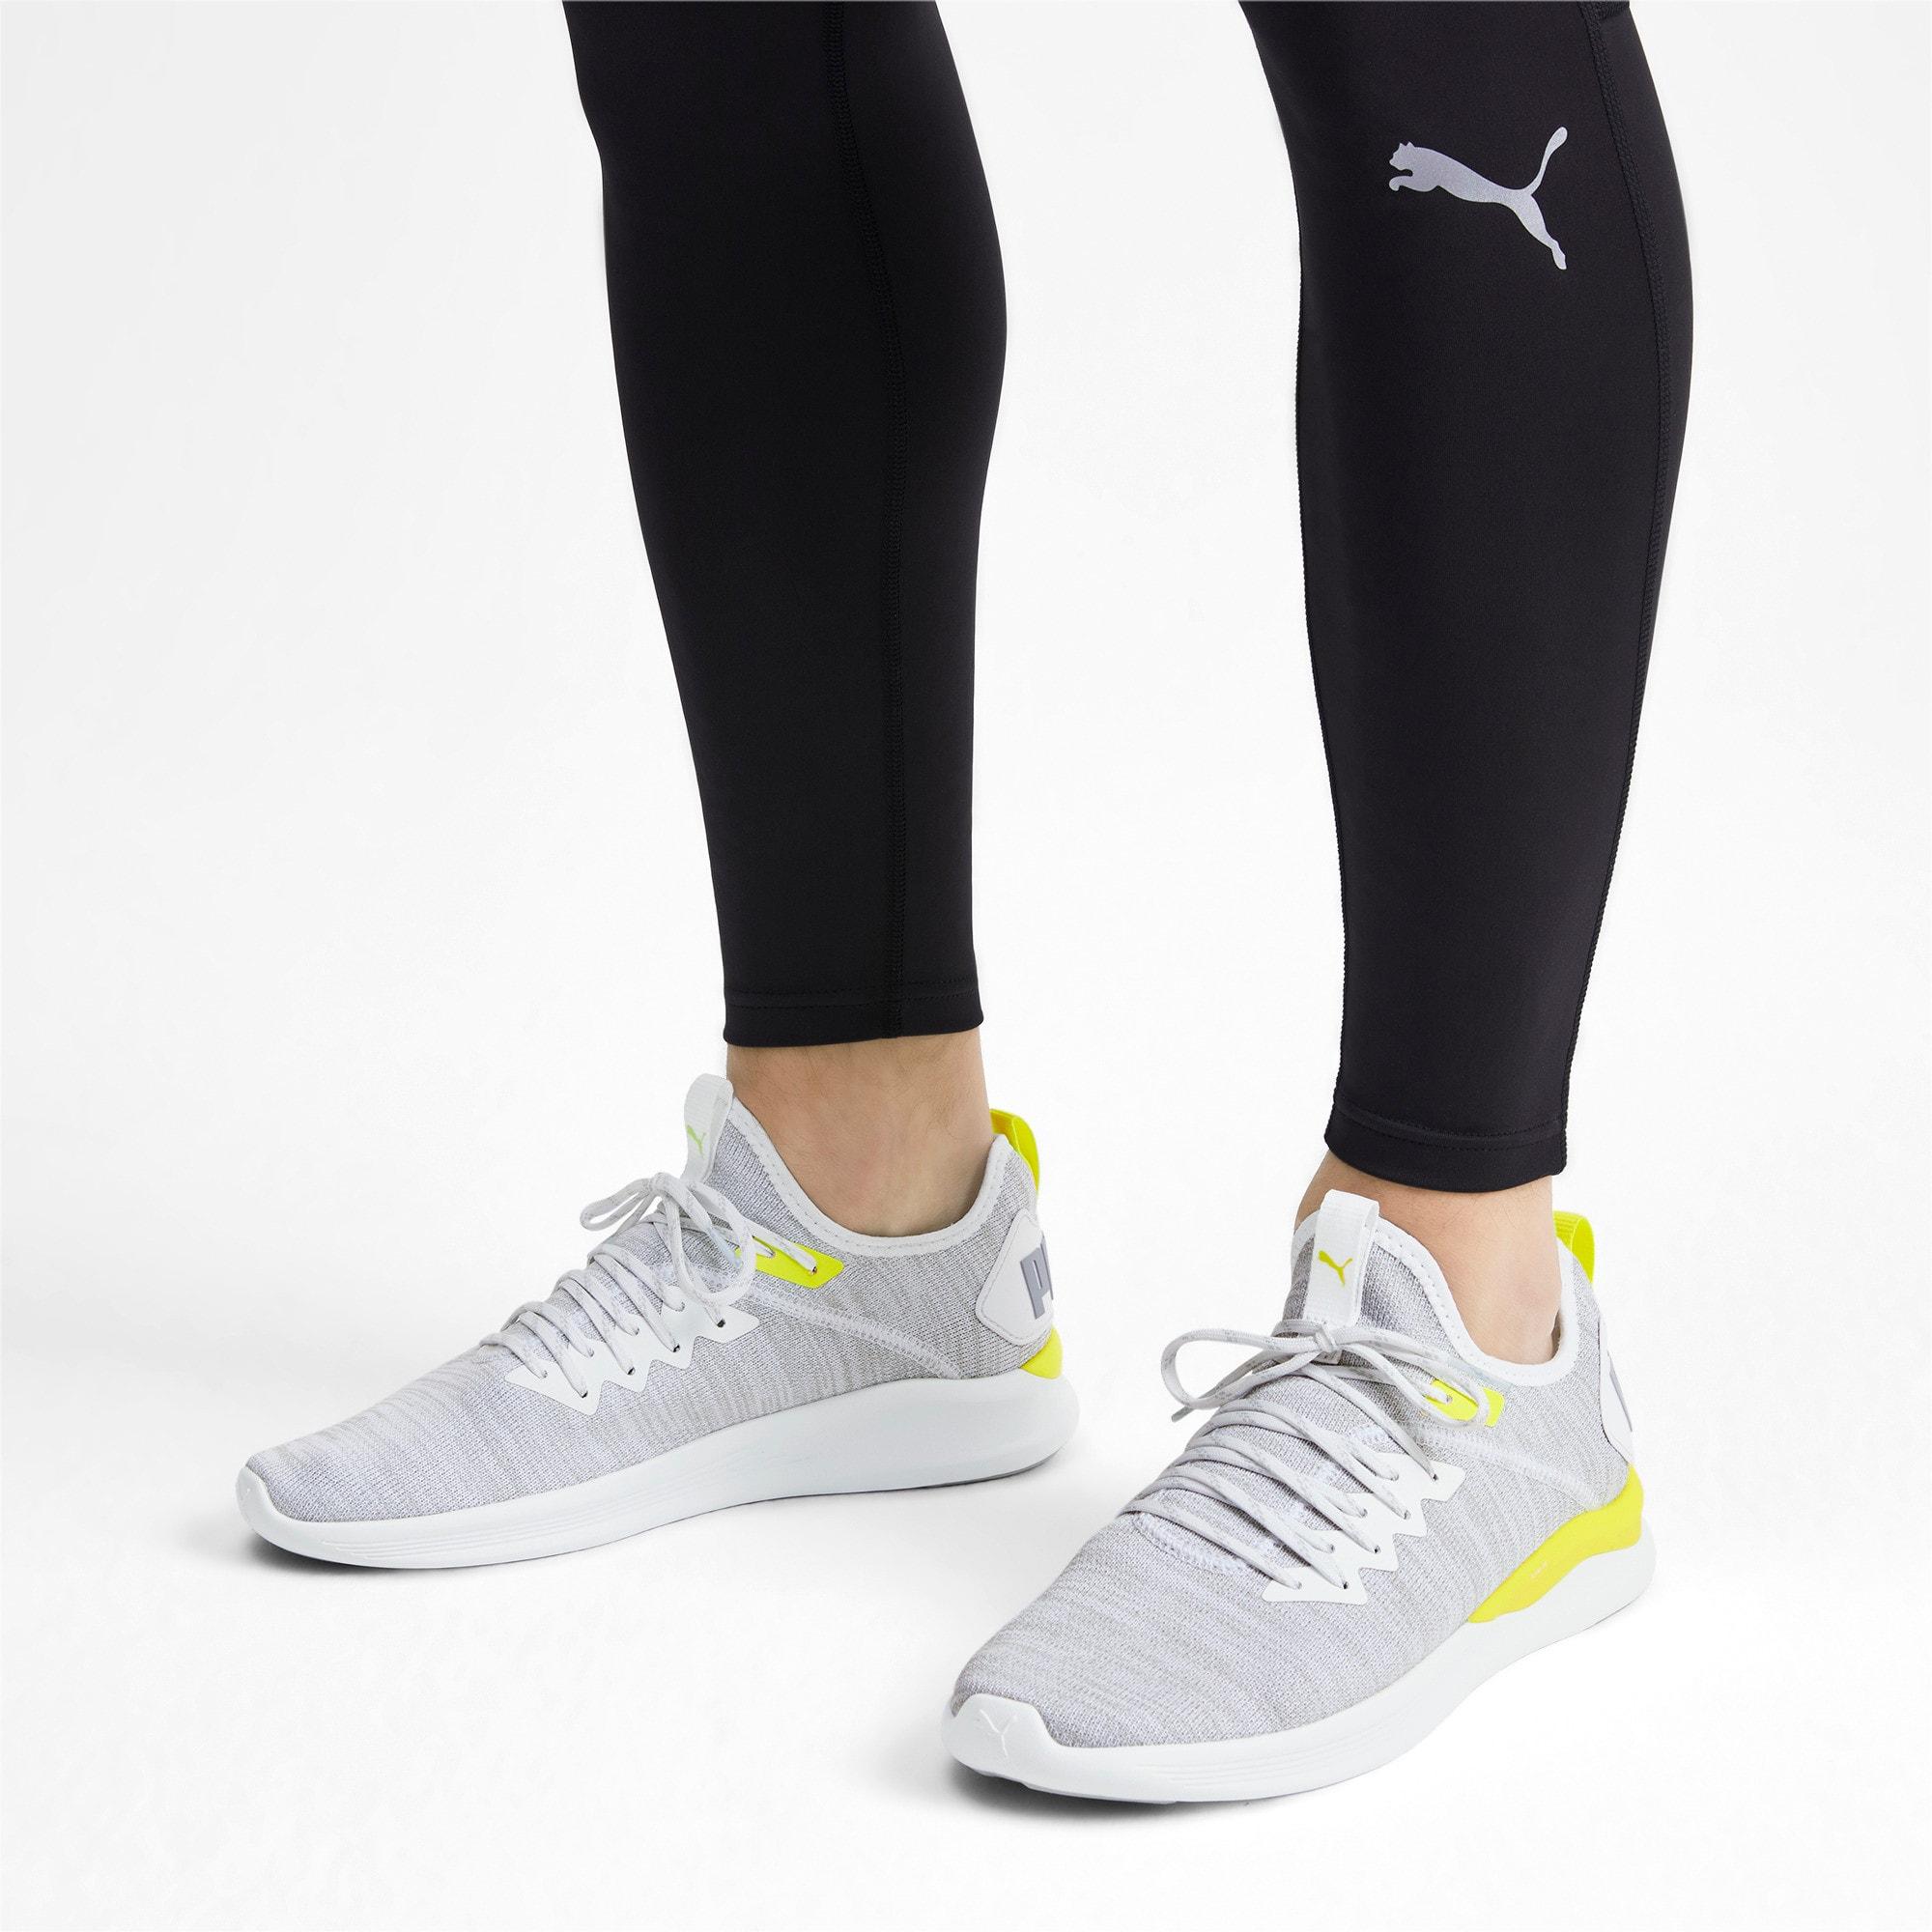 Thumbnail 2 of IGNITE Flash evoKNIT Men's Training Shoes, White-High Rise-Yellow Alert, medium-IND